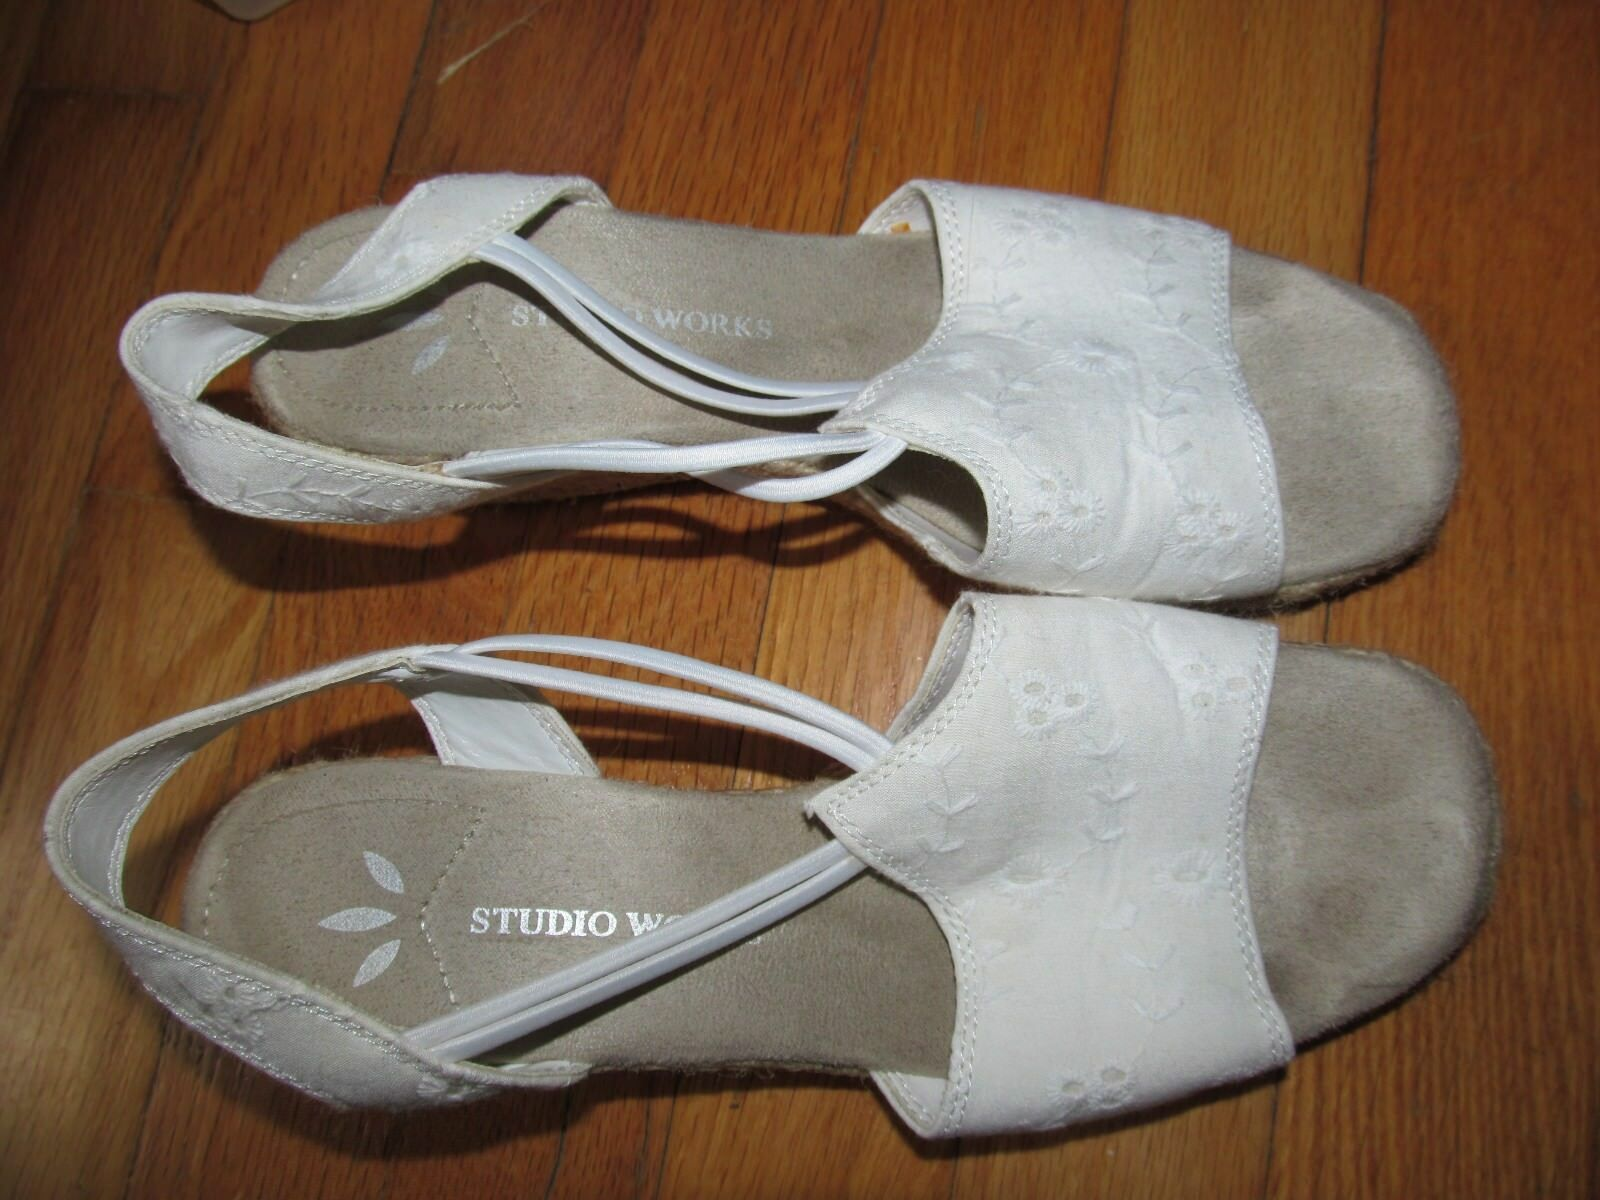 Women's Studio Works Platform White With Twine Look Platform Works Sandal Shoe Size 6.5 EUC f9ee90